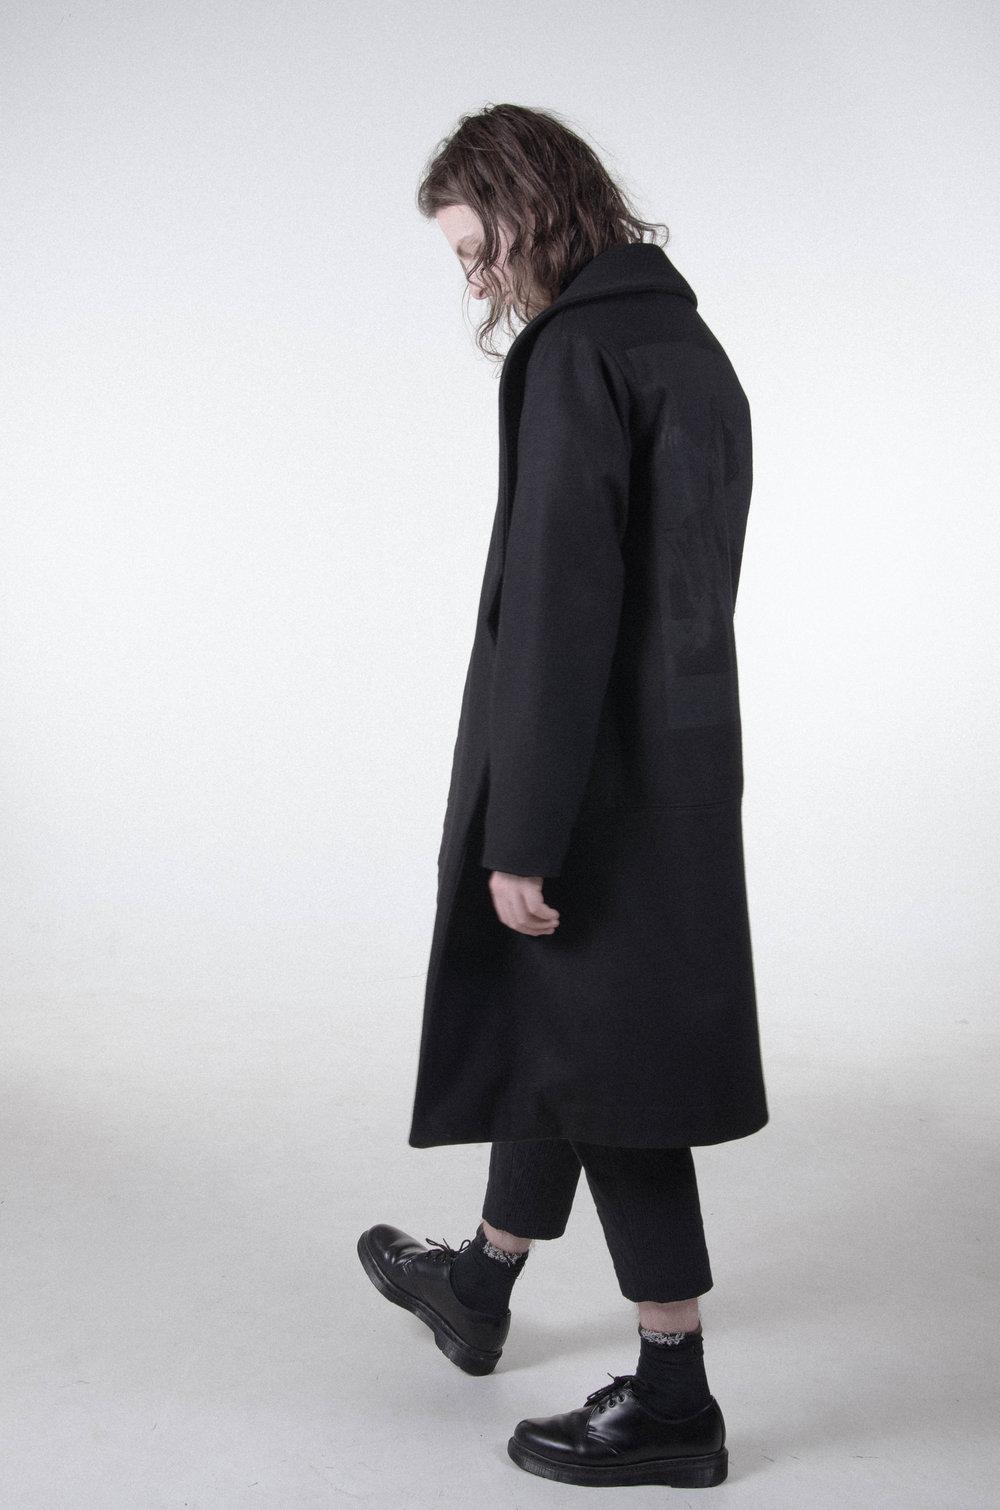 agoraphobia-collective-britt-pooley-elongated-lapel-bowie-coat